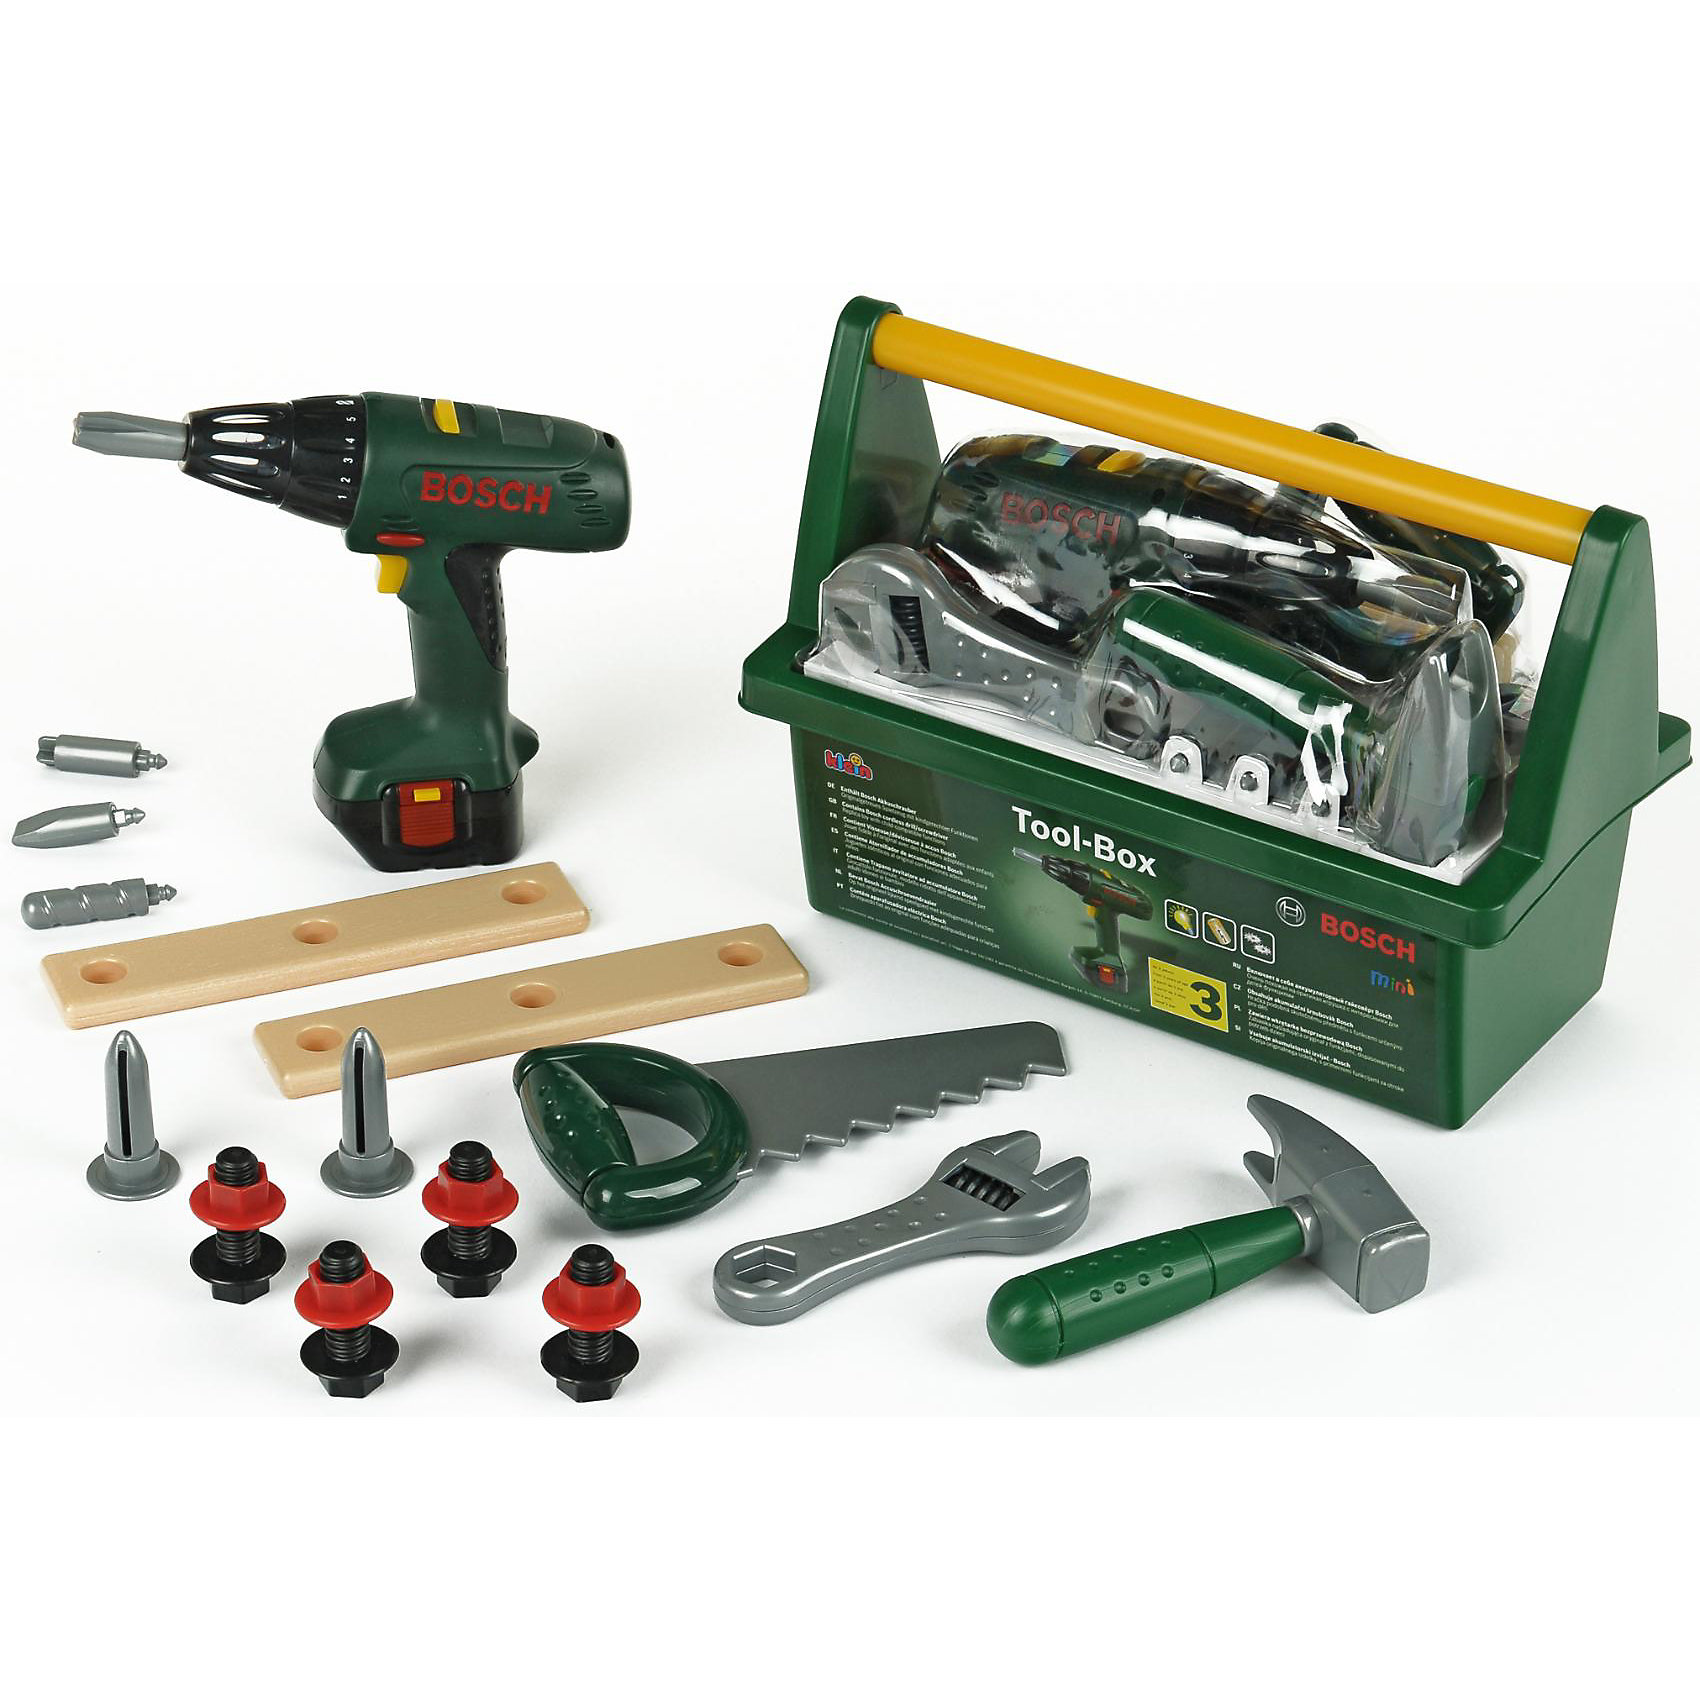 klein Набор инструментов с дрелью Bosch, Klein